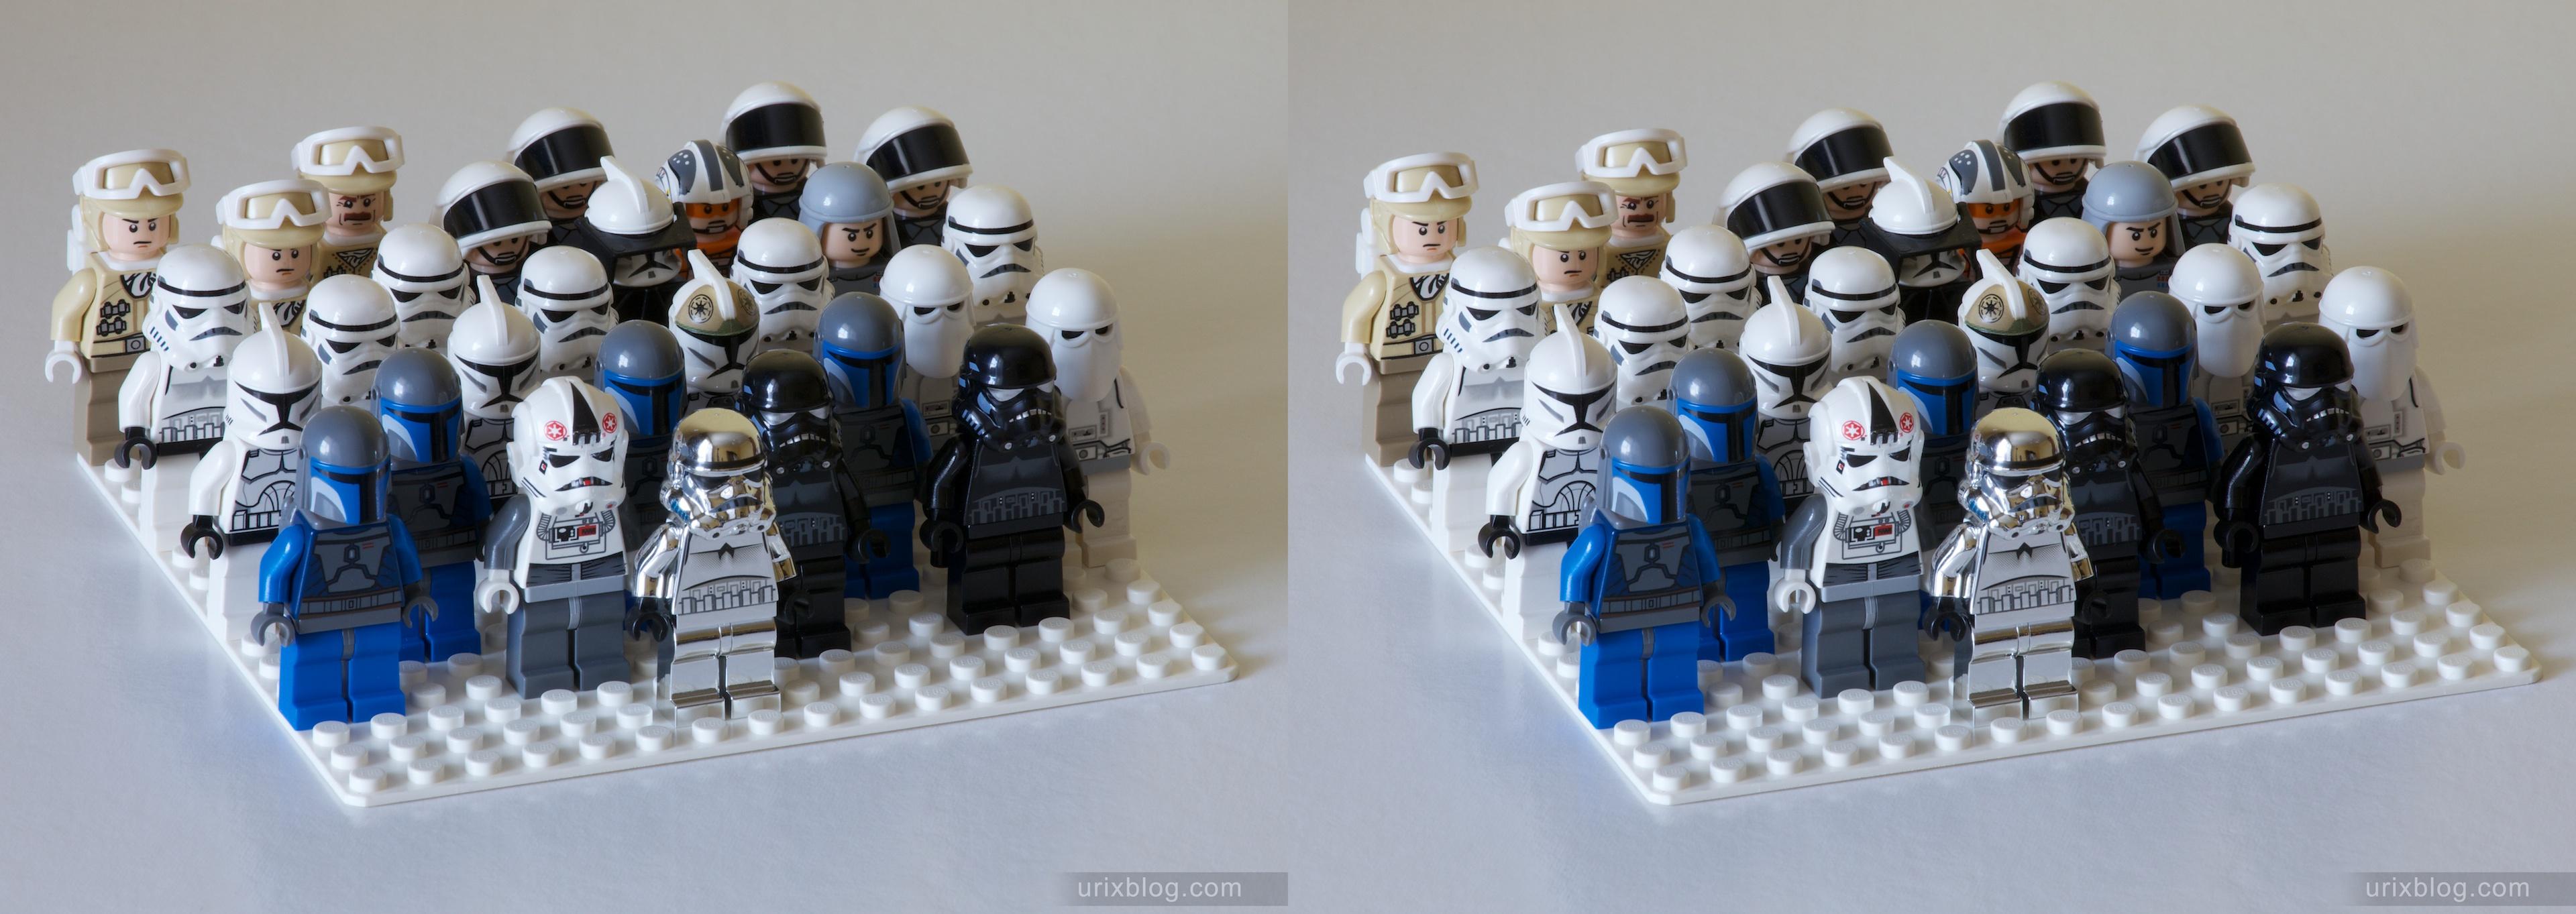 Lego Star Wars Troops 3D stereo Лего Звёздные войны солдатики 3Д стерео